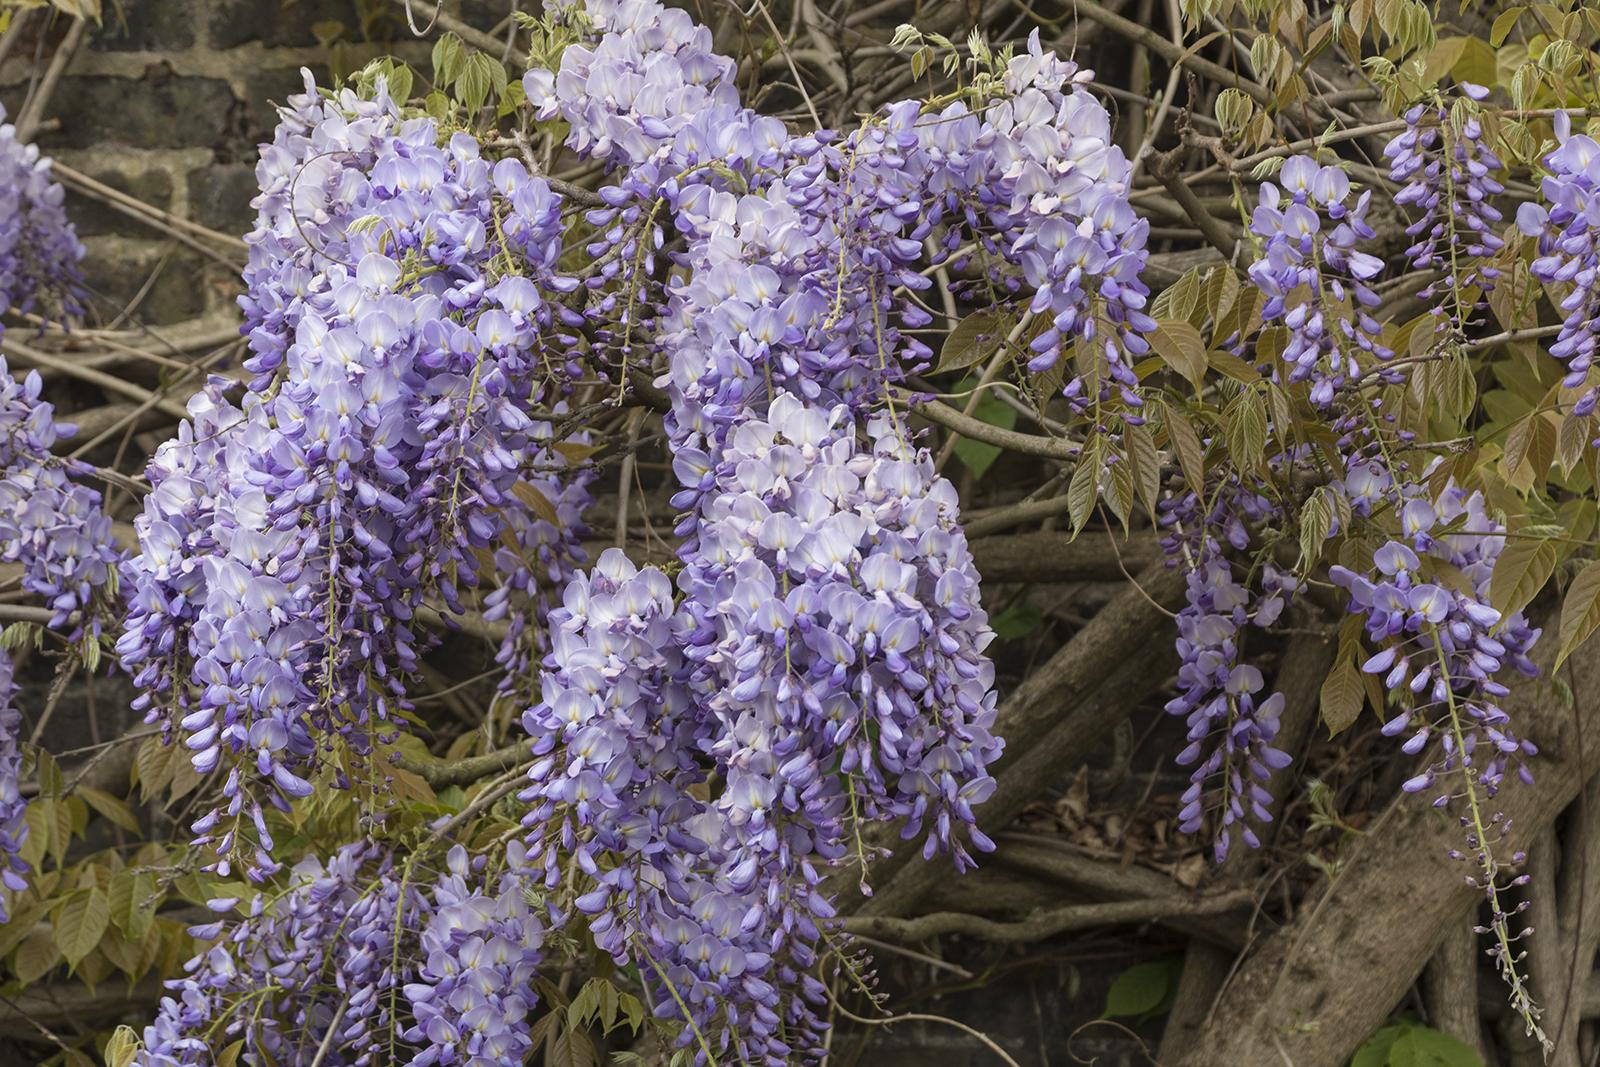 2017-04-17-Kensington-and-Chelsea_Spring_Flora_Holland-Park-Wysteria-2